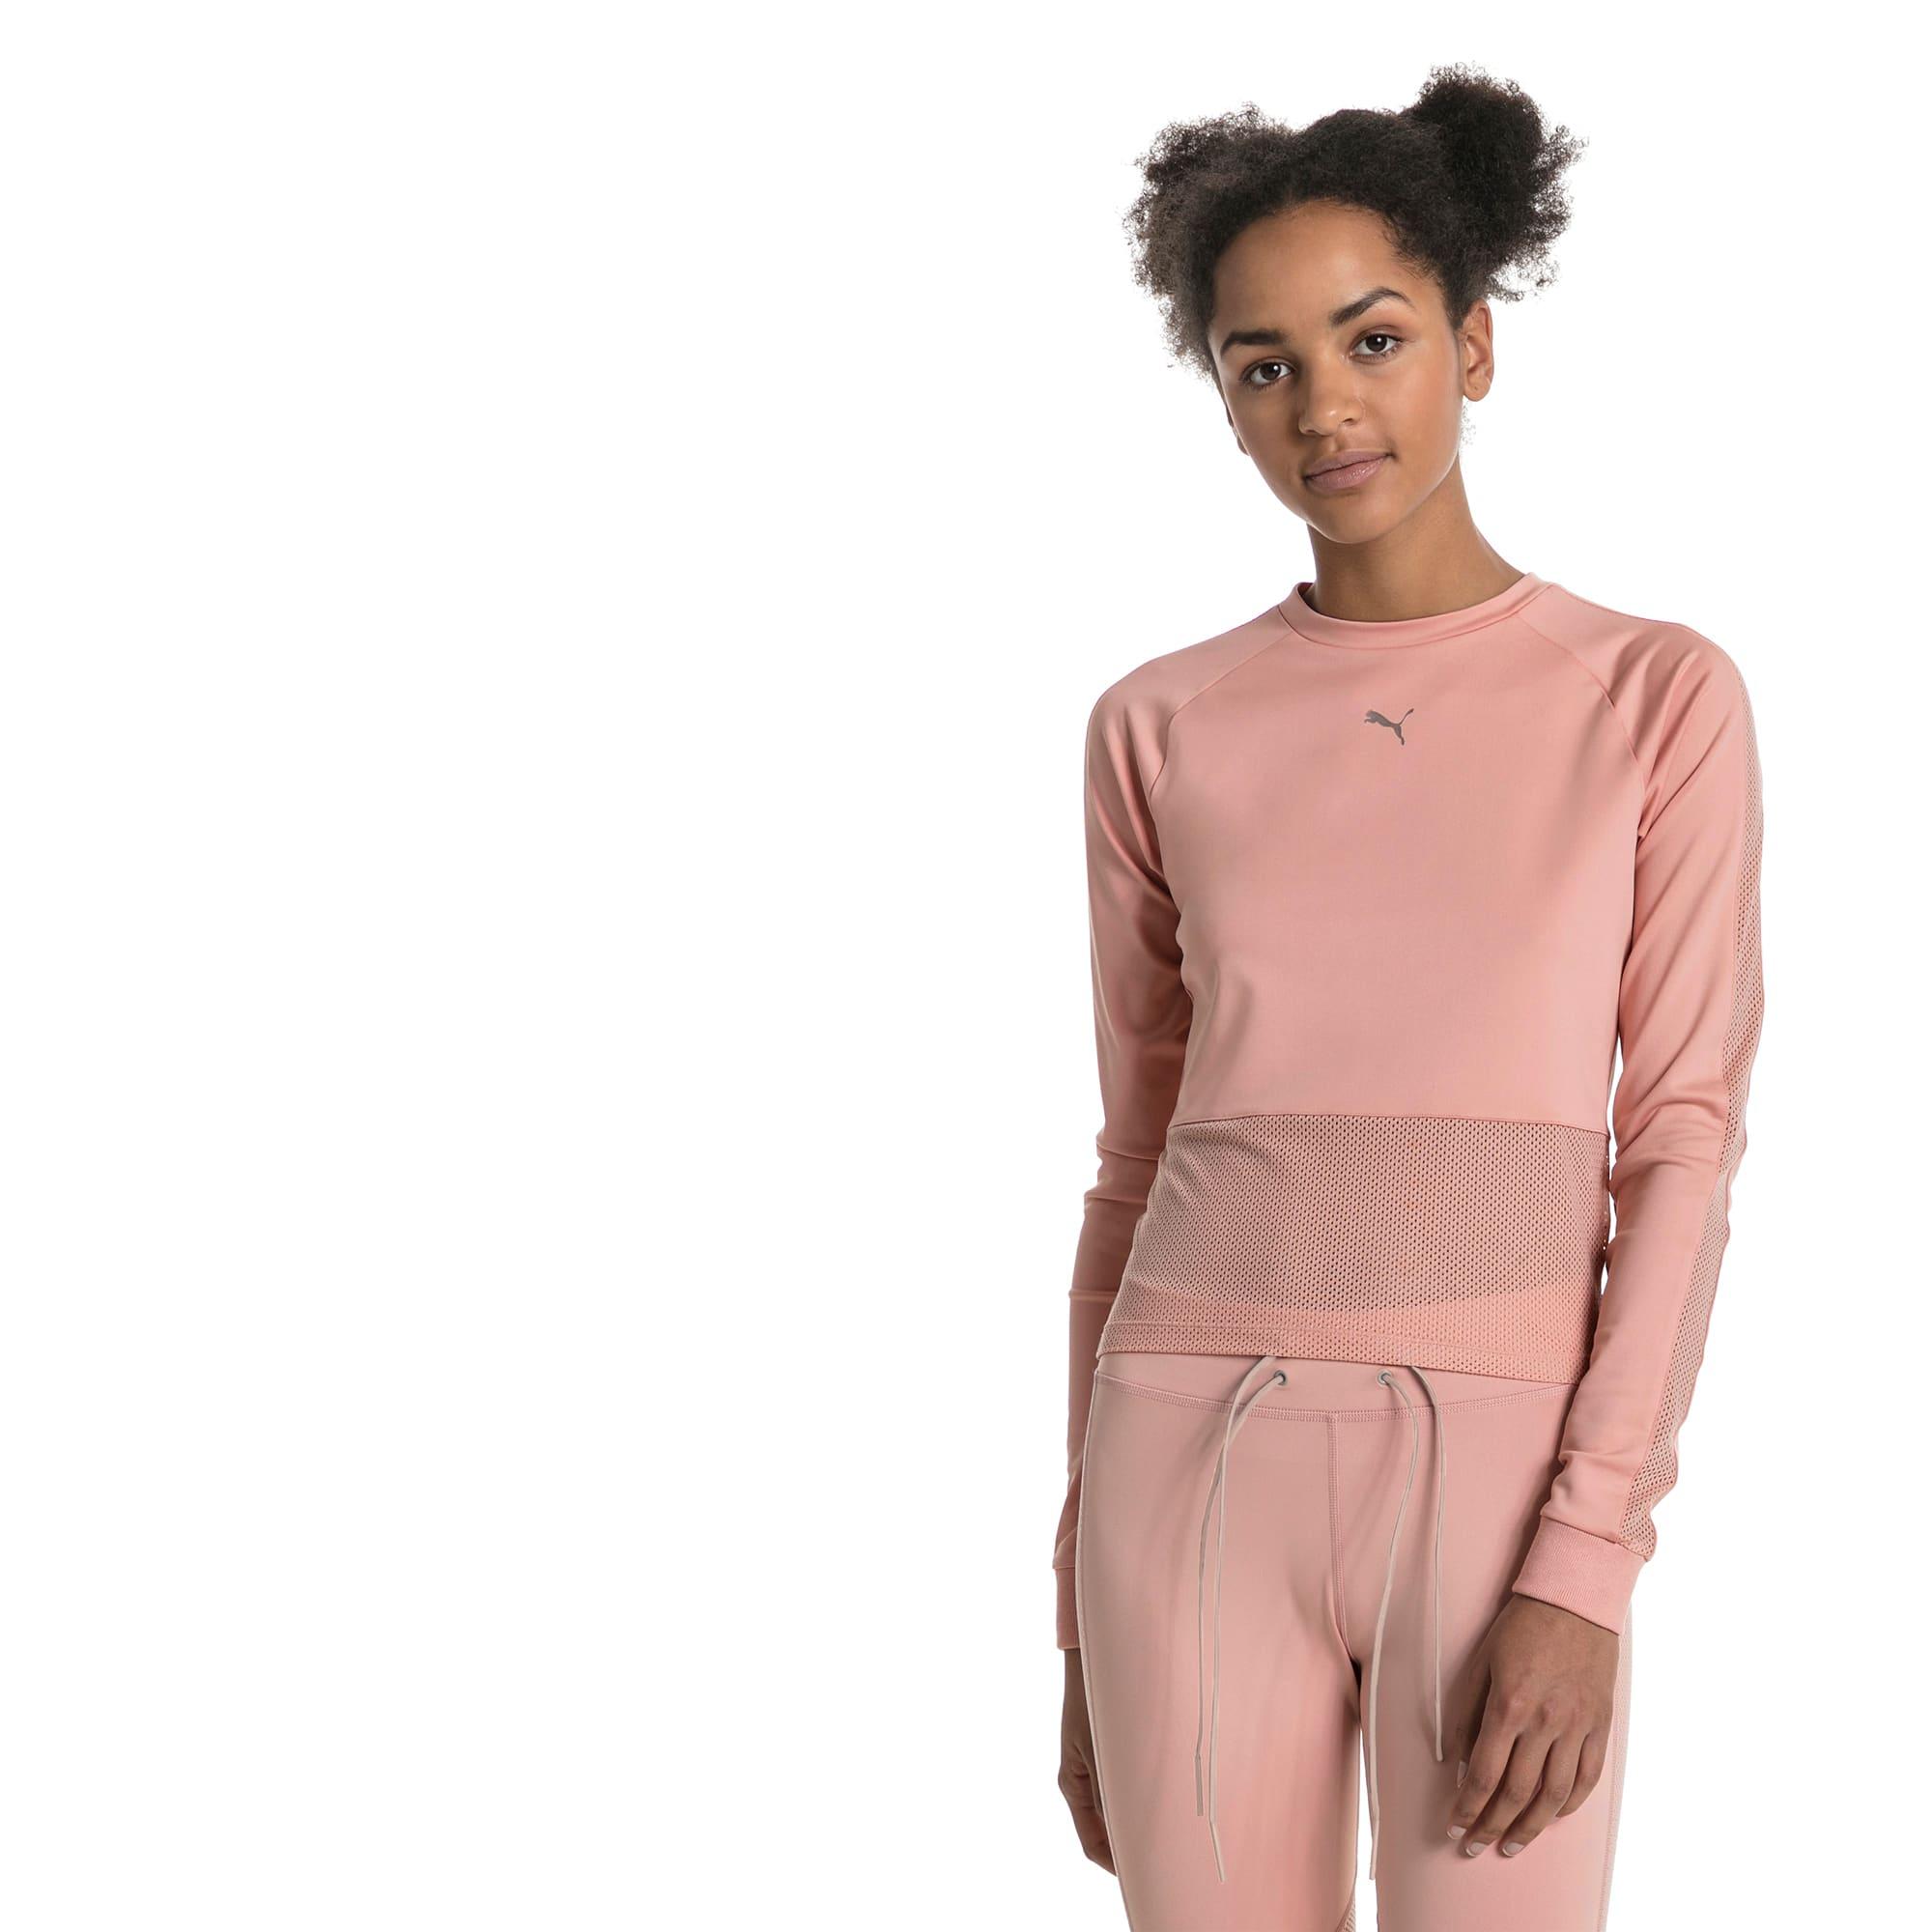 En Pointe Enges Damen Langarm Shirt | PUMA Neue Styles